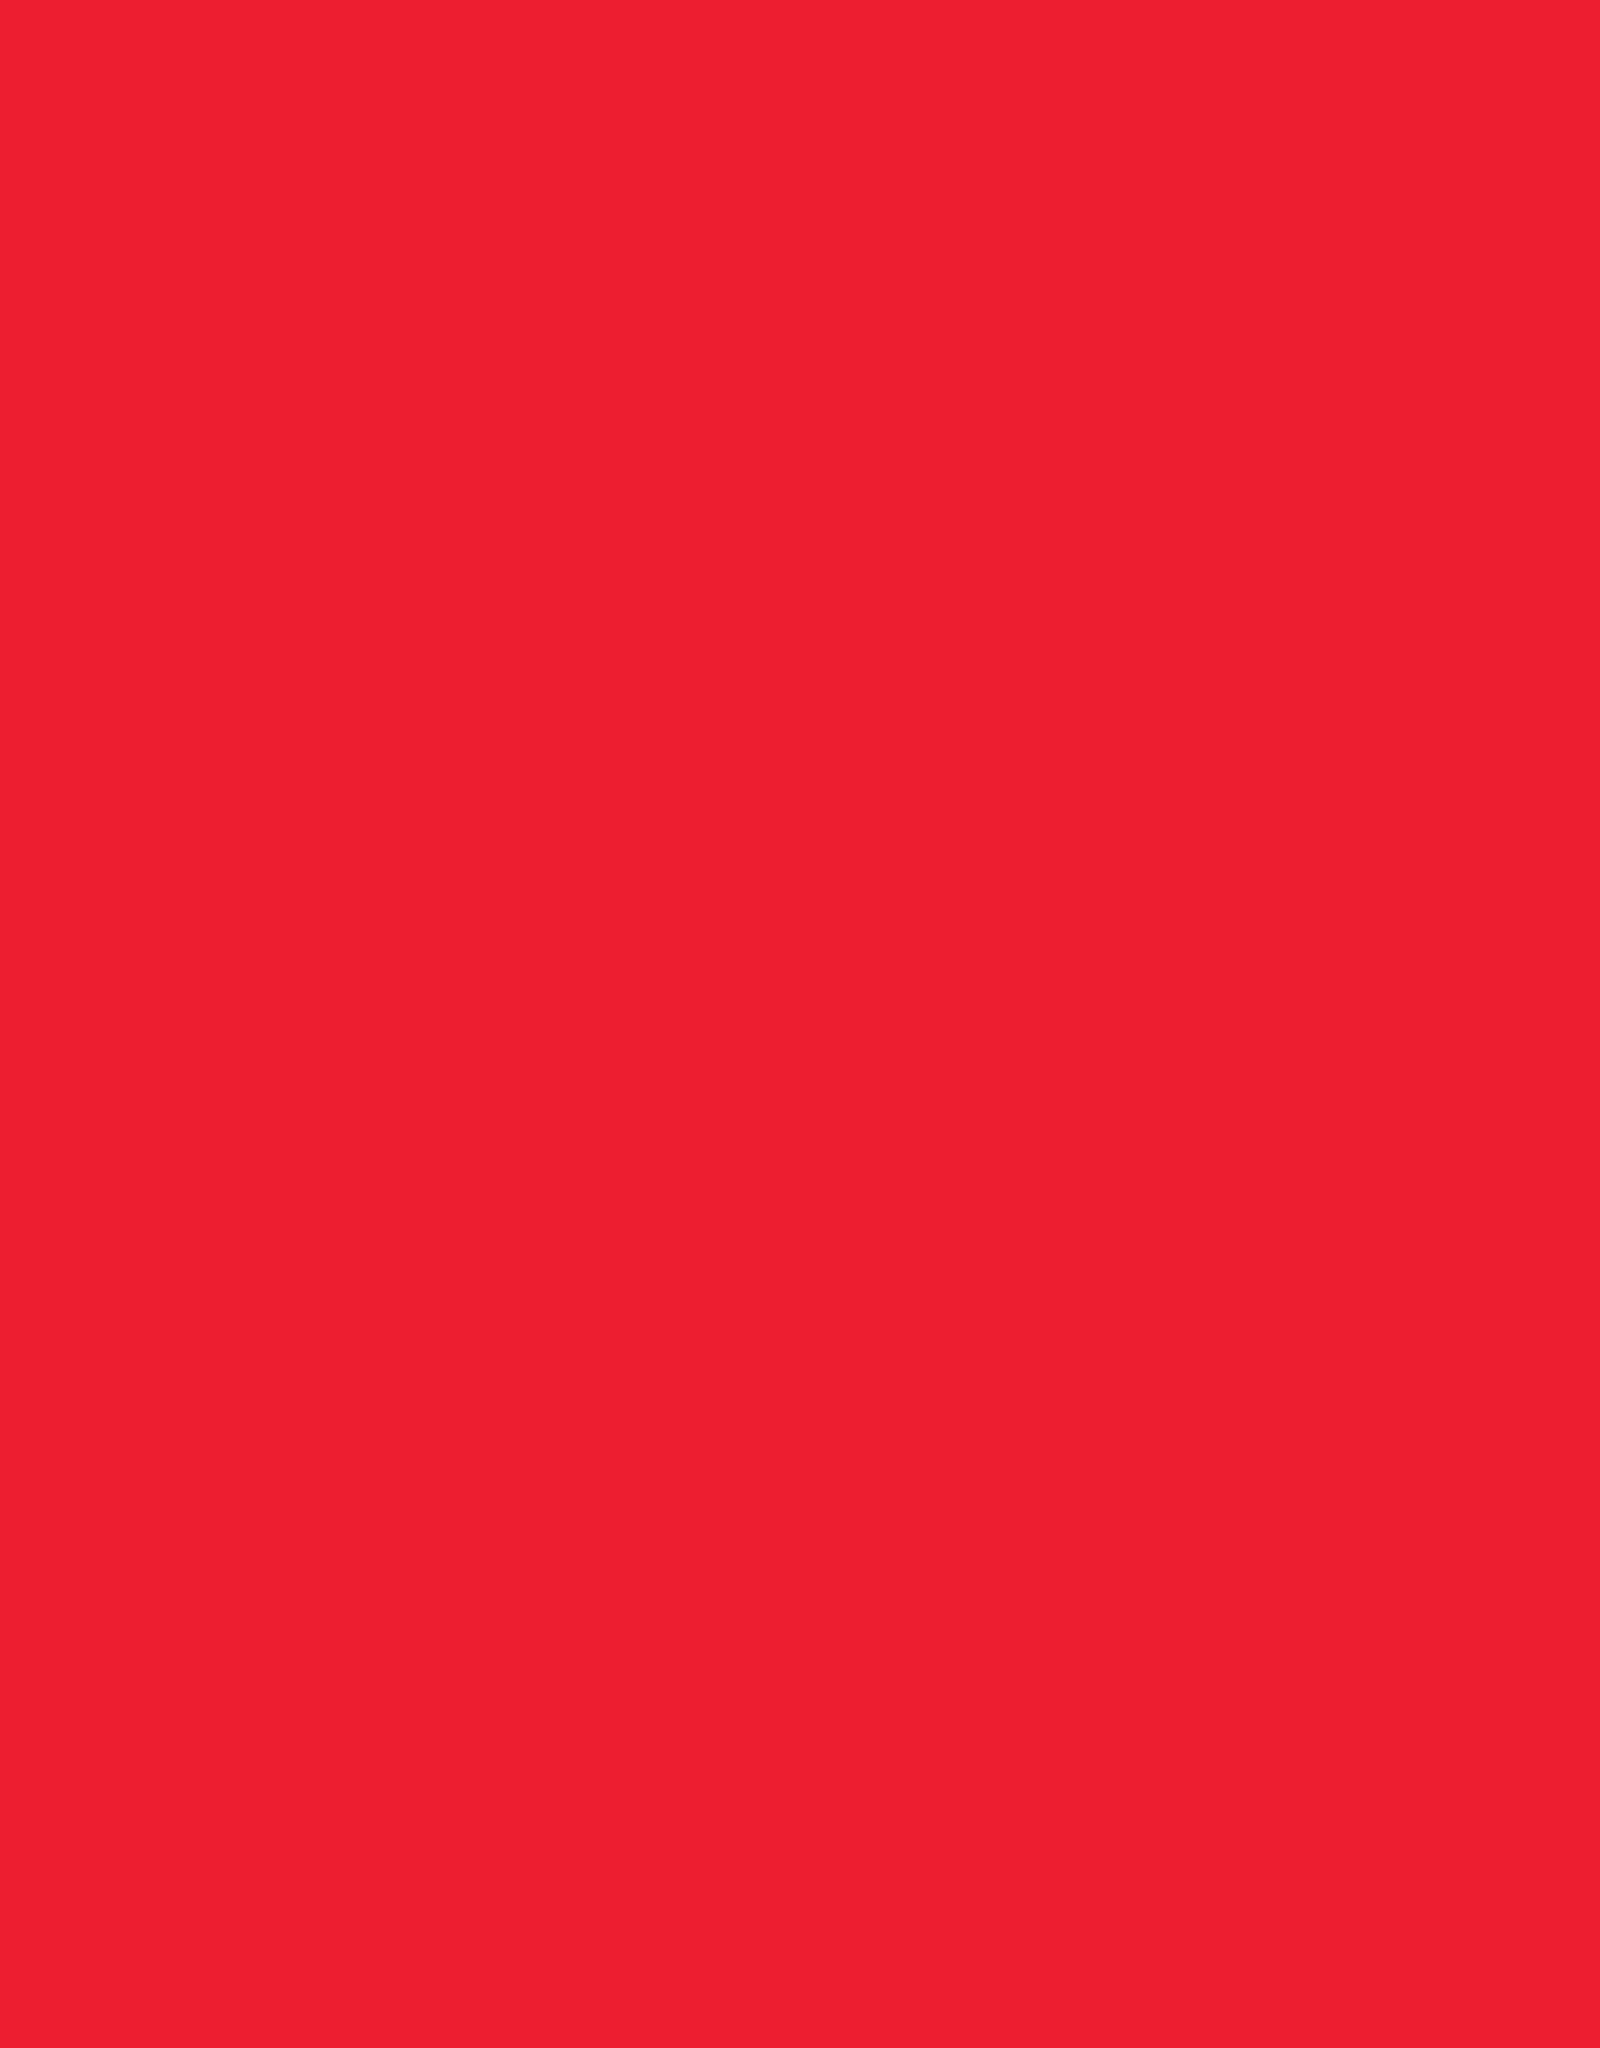 Jacquard Jacquard Acid Dye Scarlet